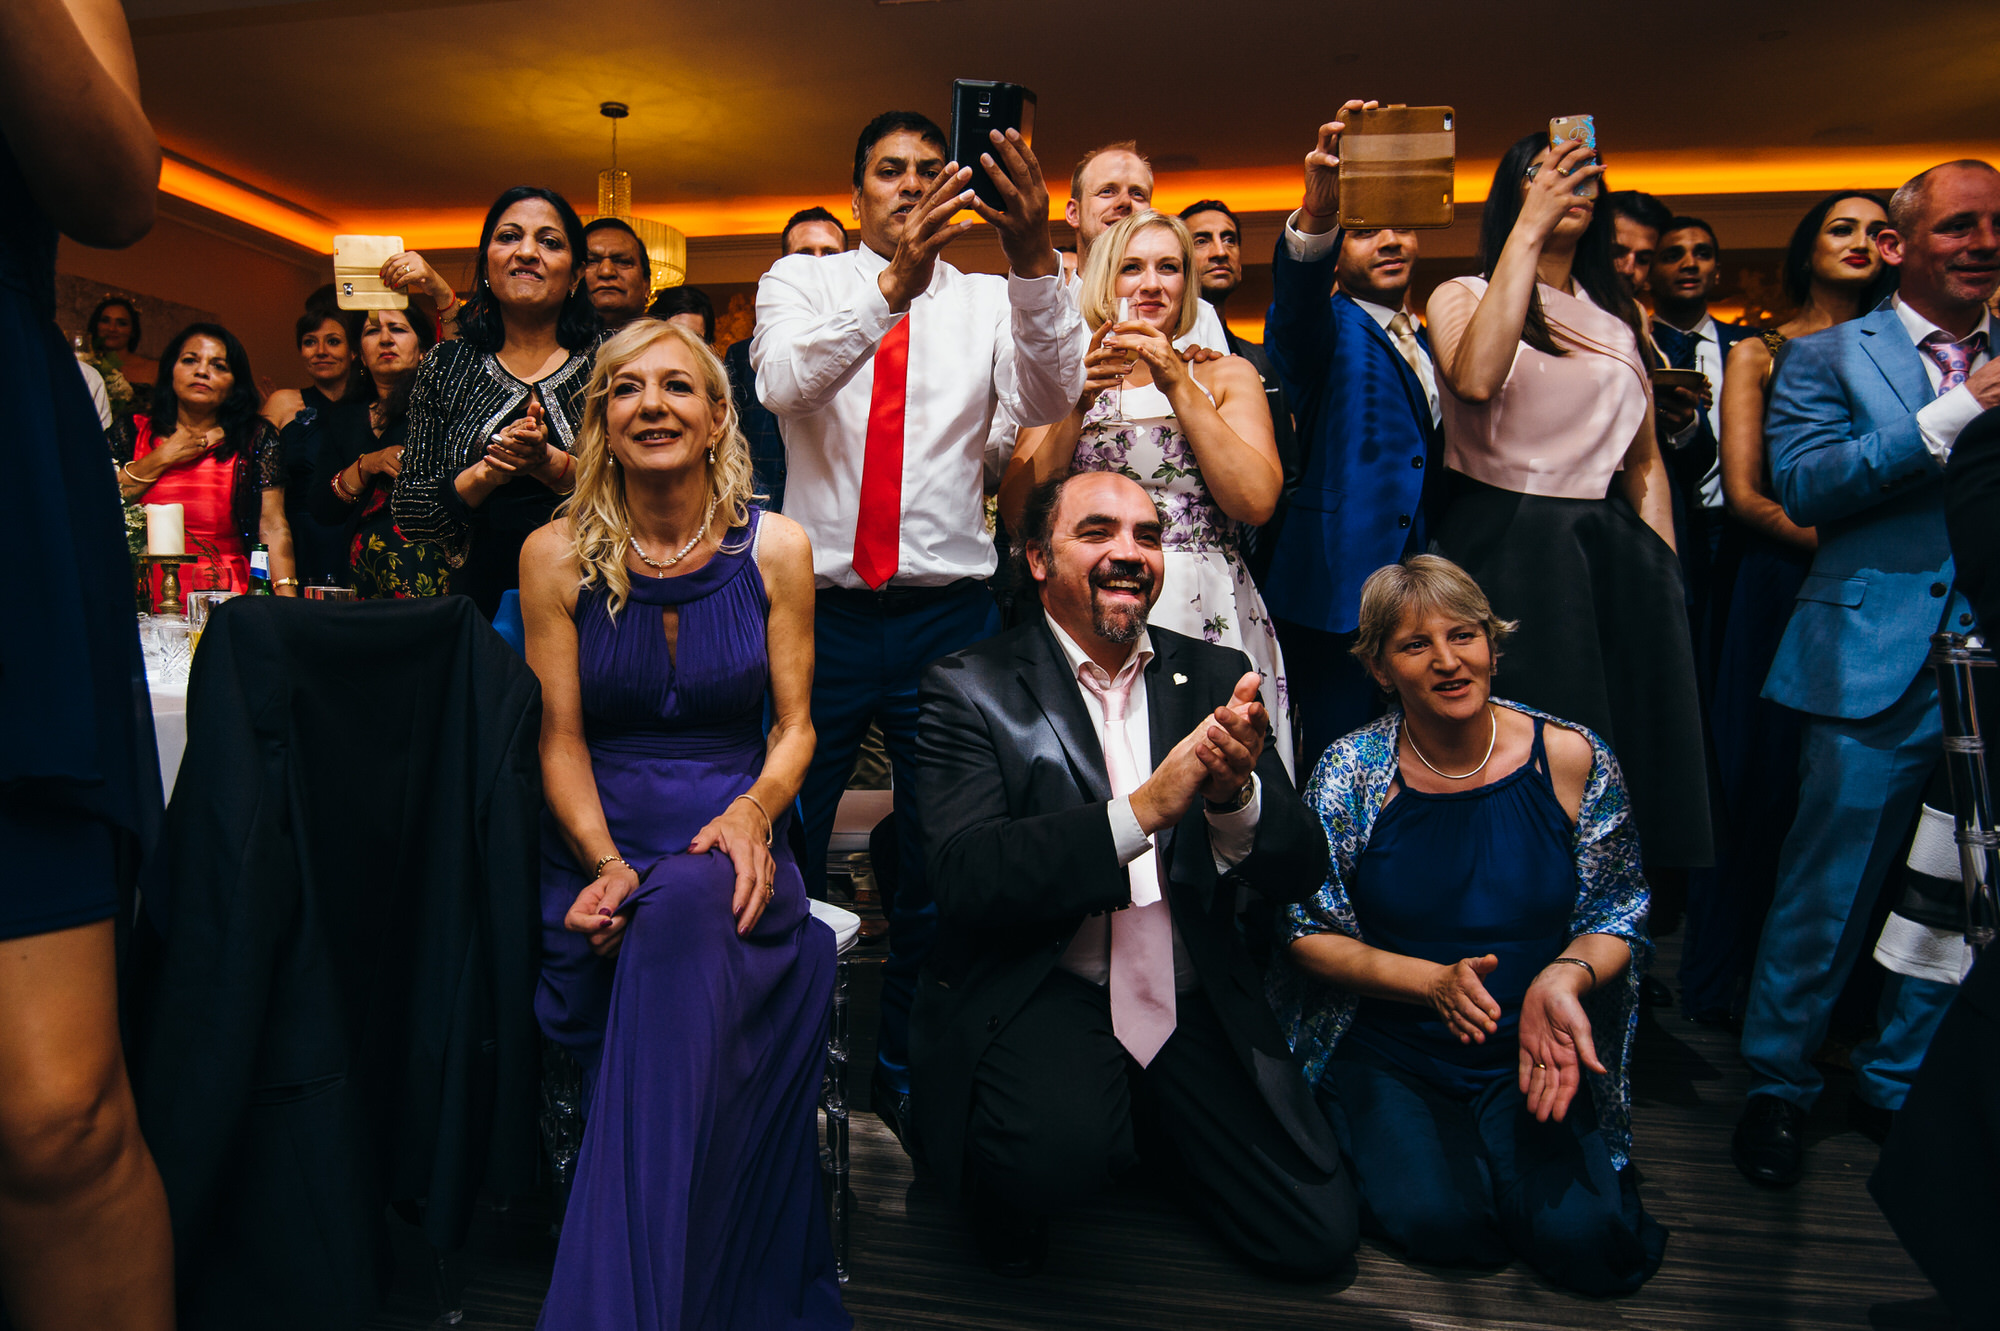 Merrydale manor wedding photography 109